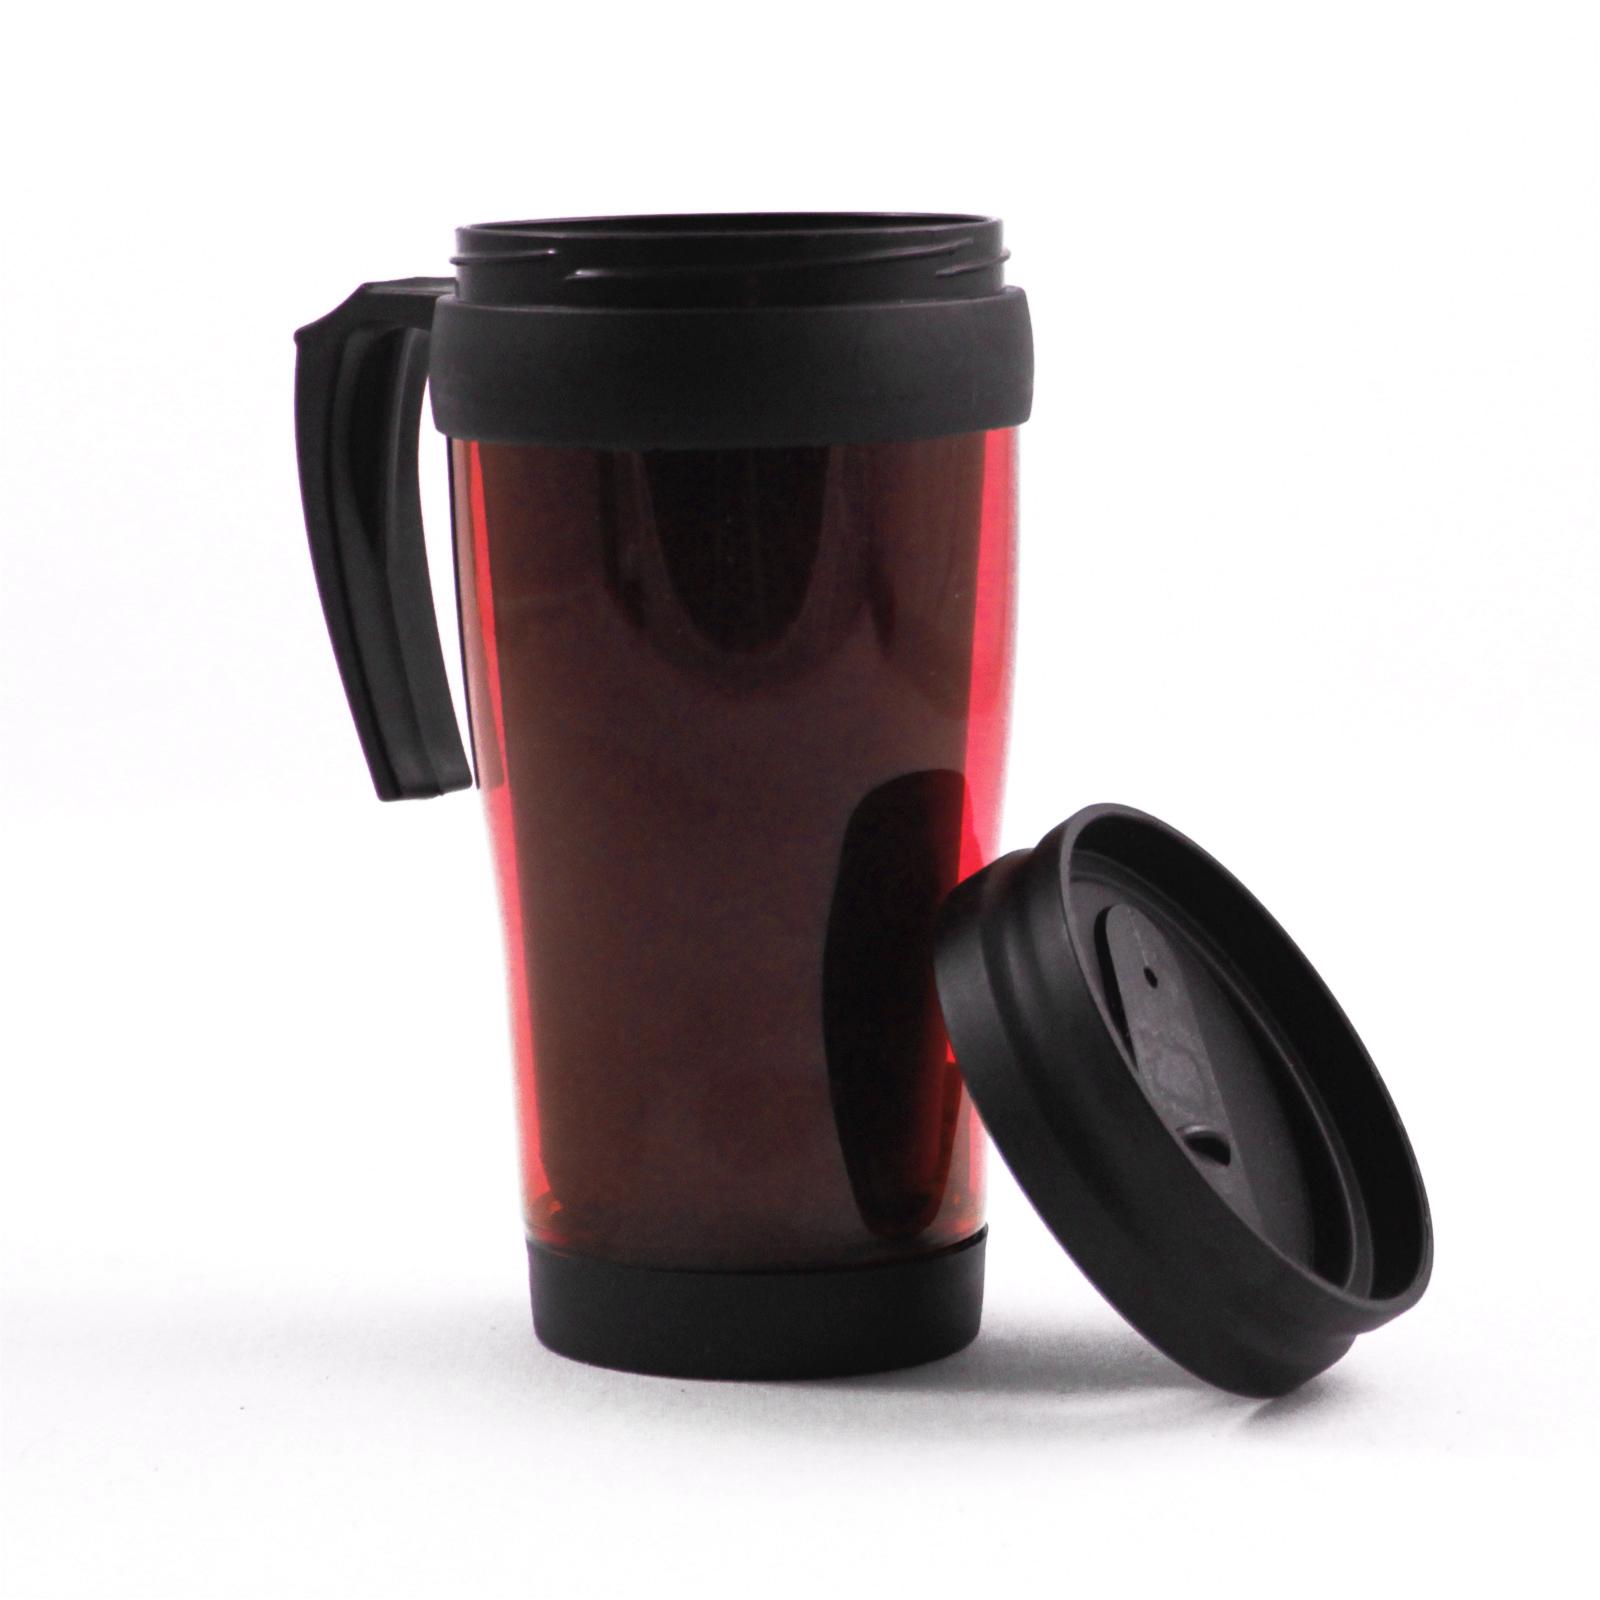 2pk Travel Mug Car Coffee Cup 16oz Beverage Holders 2 Red Mugs